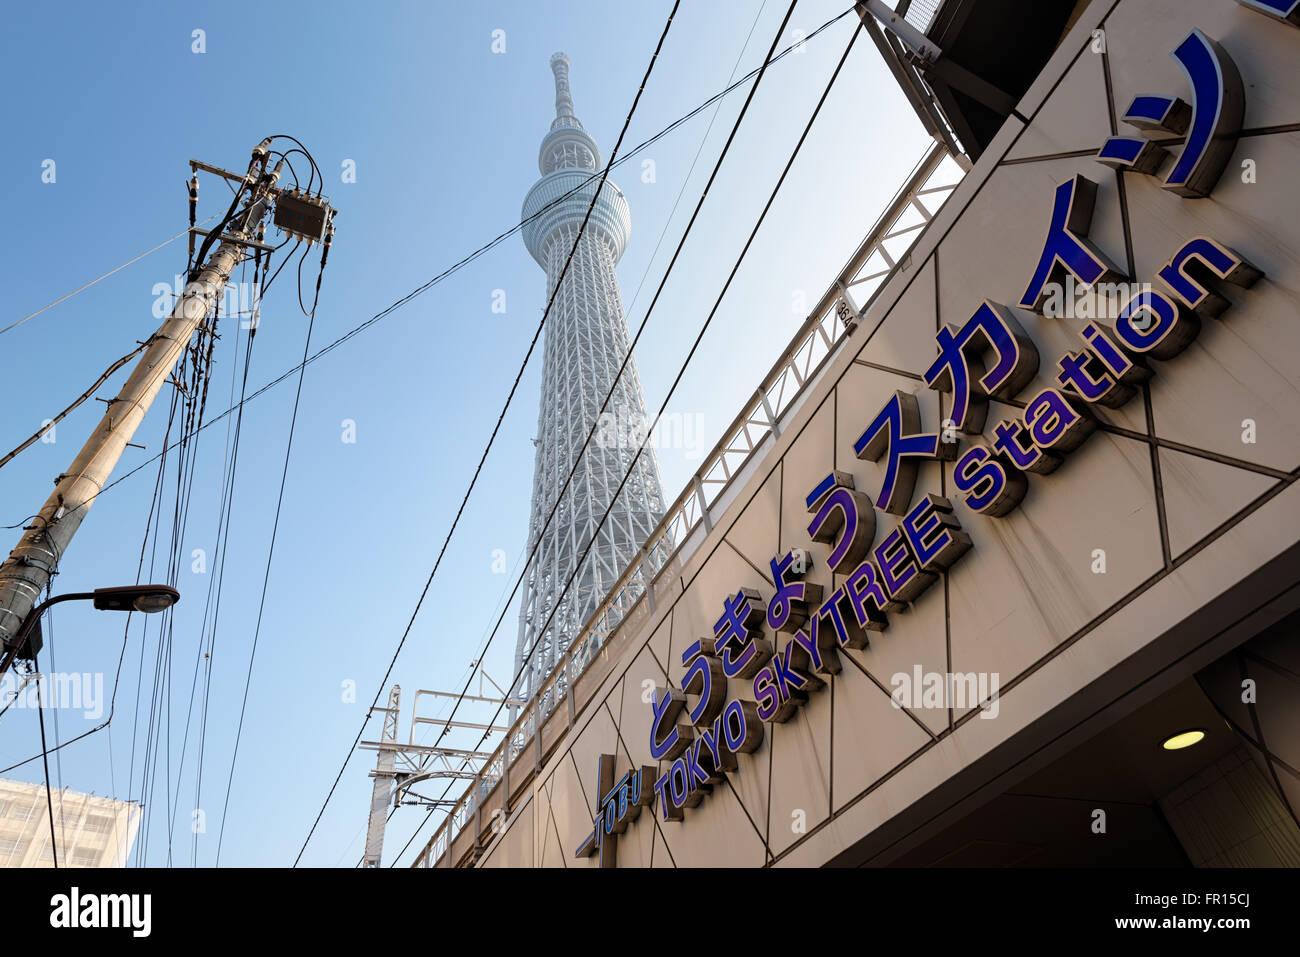 Tokyo, Japan - 16. Dezember 2015: Tokyo SkyTree in der Nähe von Tokyo Skytree Station. Tokyo Skytree eines Stockbild